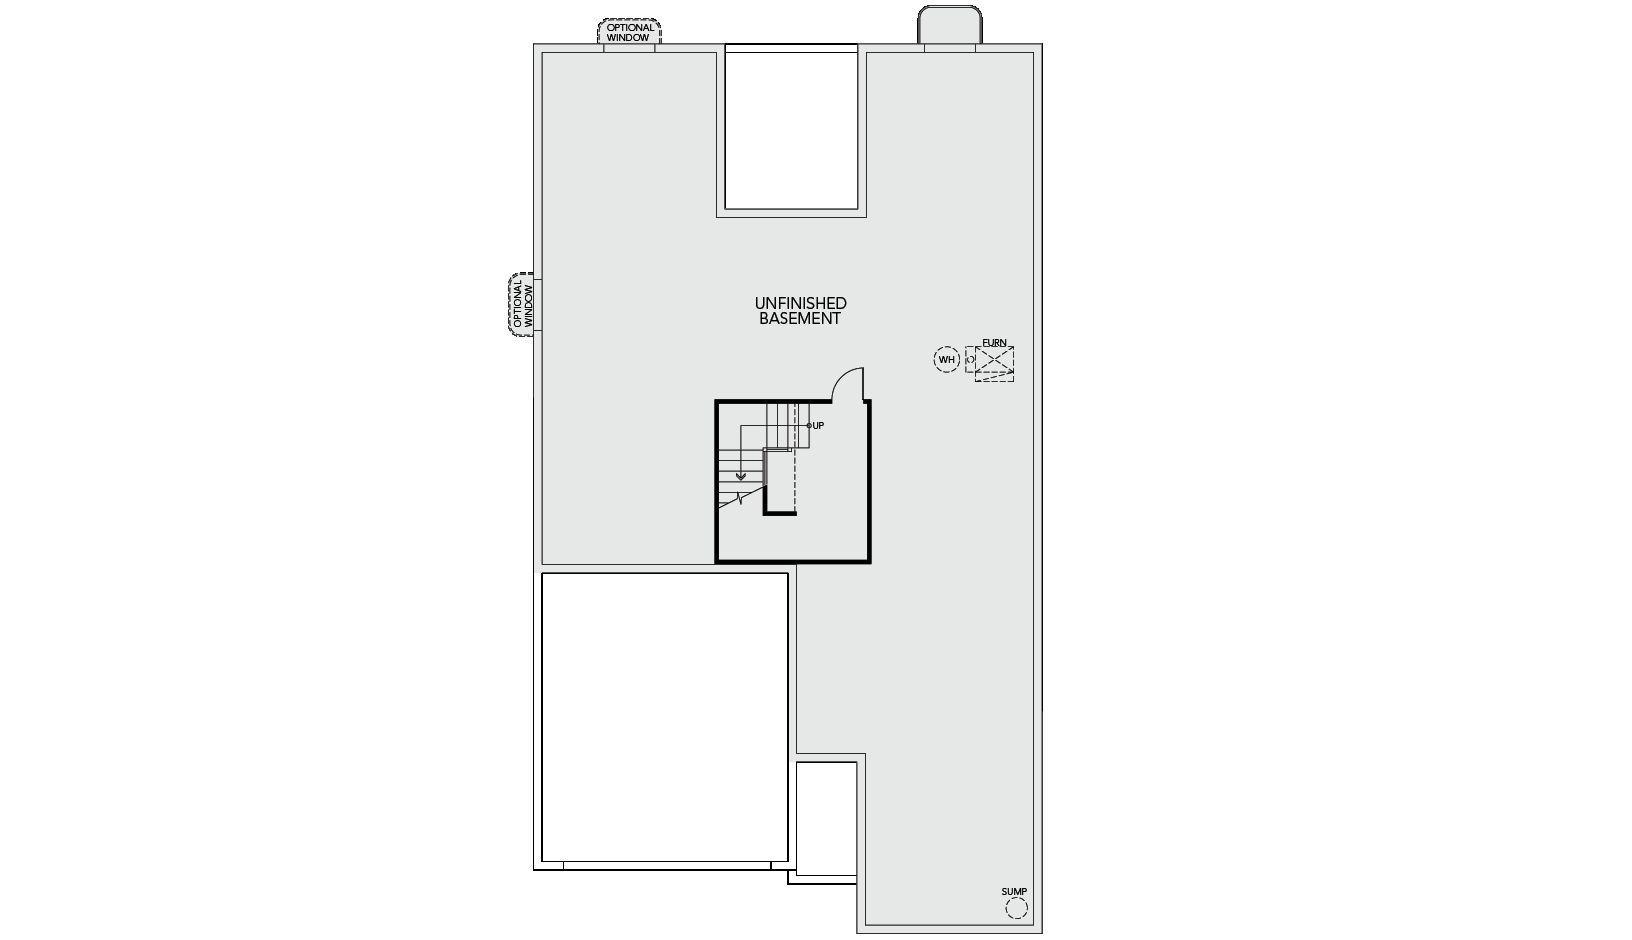 4844 Basalt Ridge Circle Tri Pointe Floorplan 4007 Unfinishedbasement